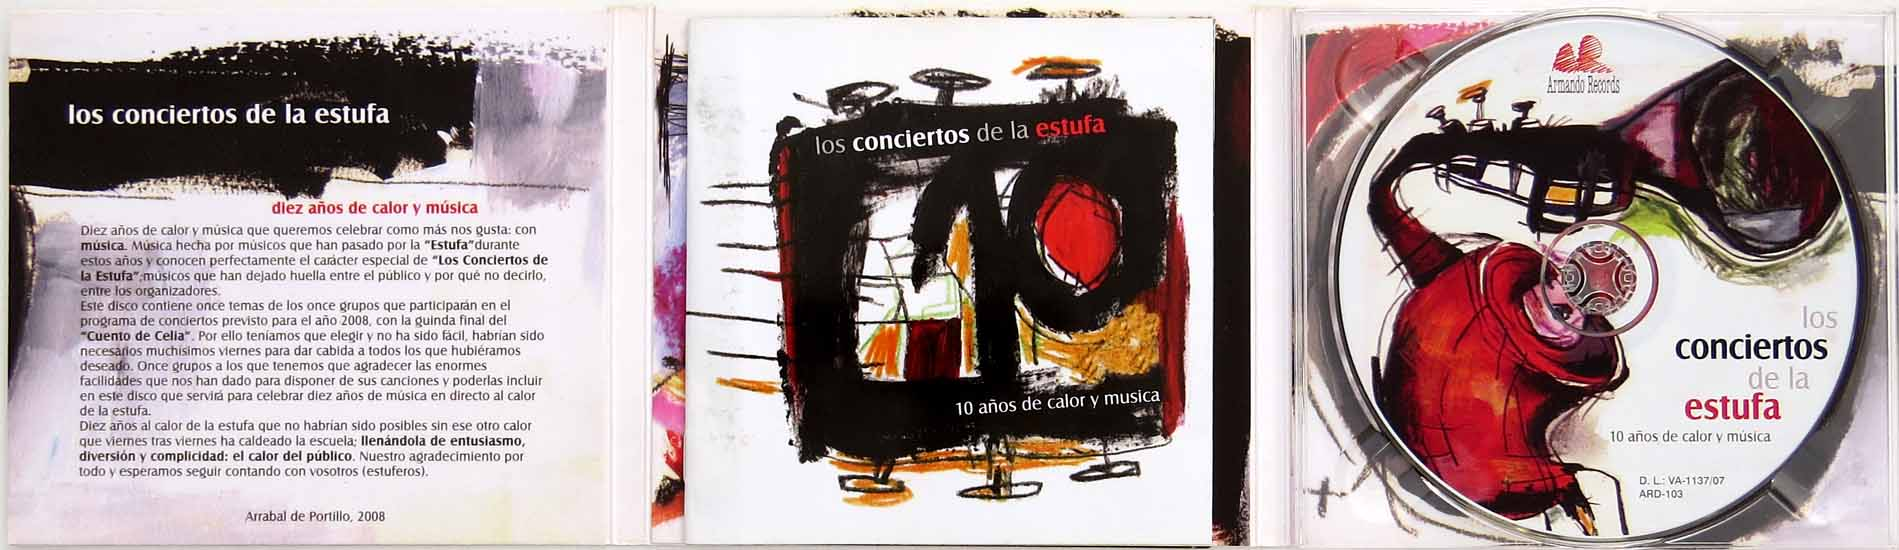 Disco Libro Duplicación Armando Records Valladolid España